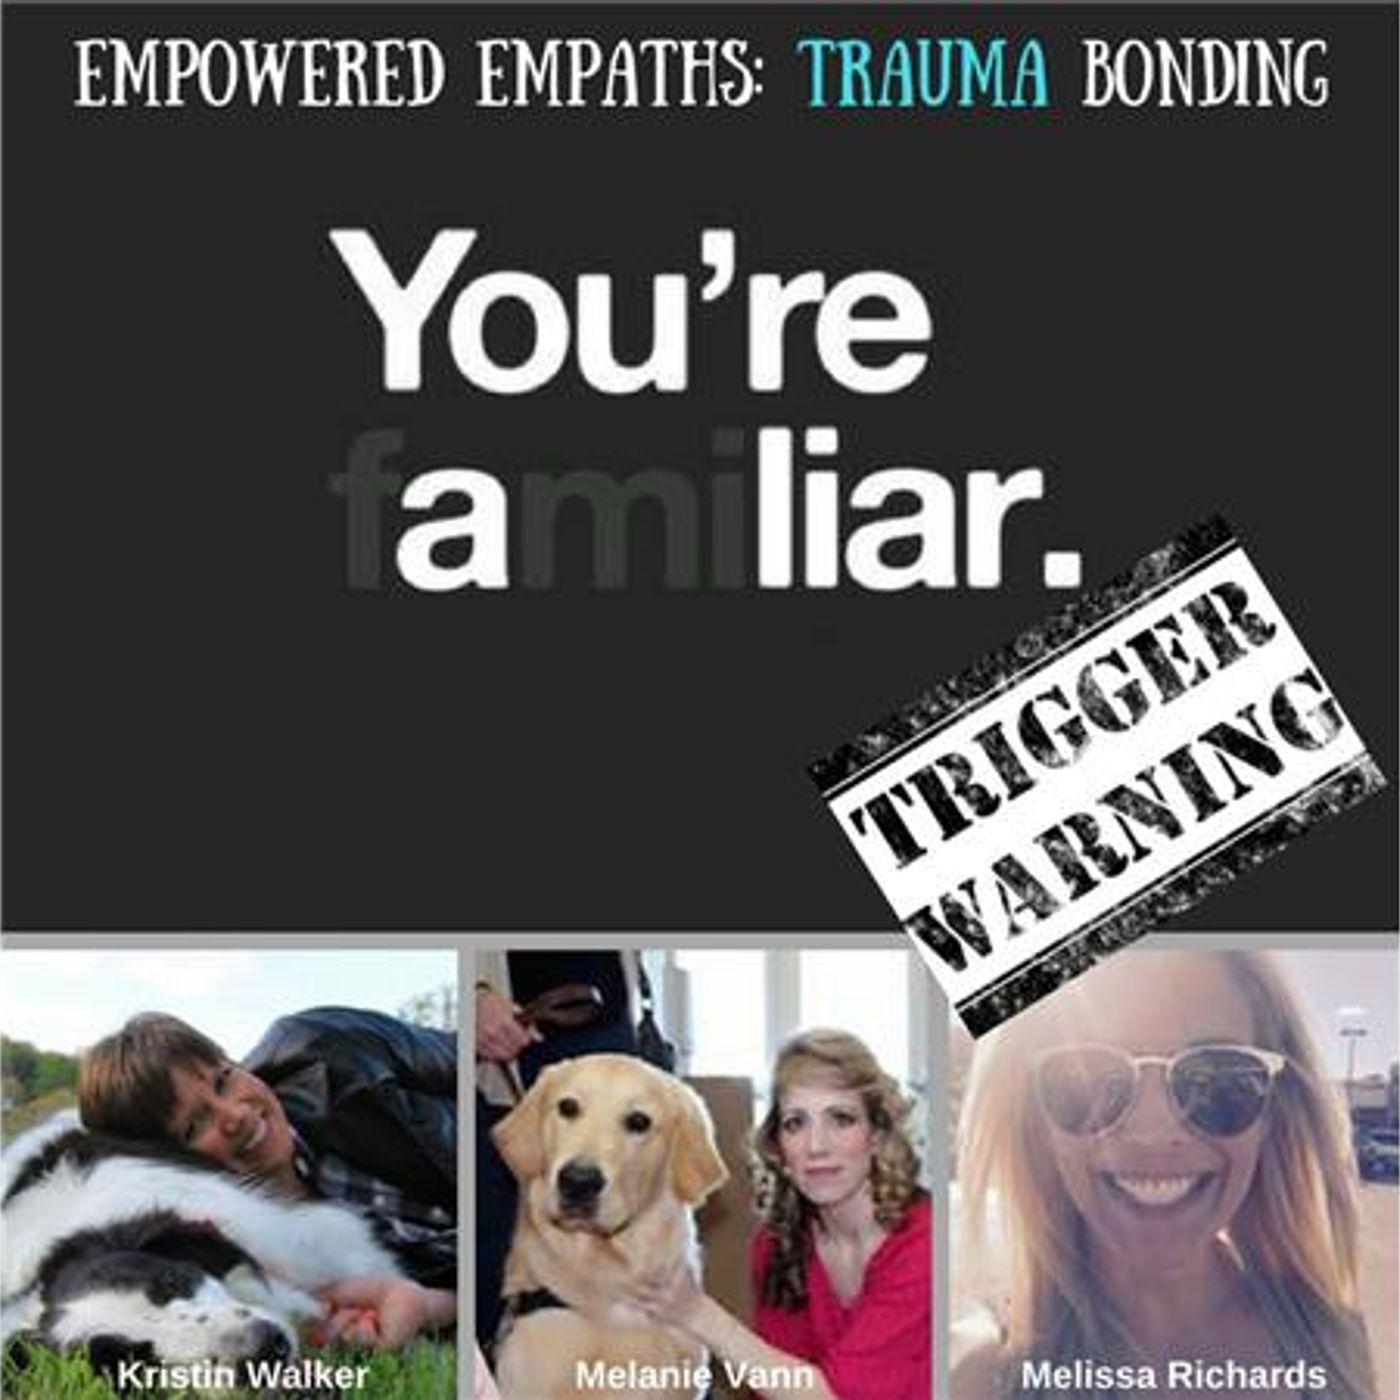 Mental Health News Radio - Empowered Empaths: Trauma Bonding